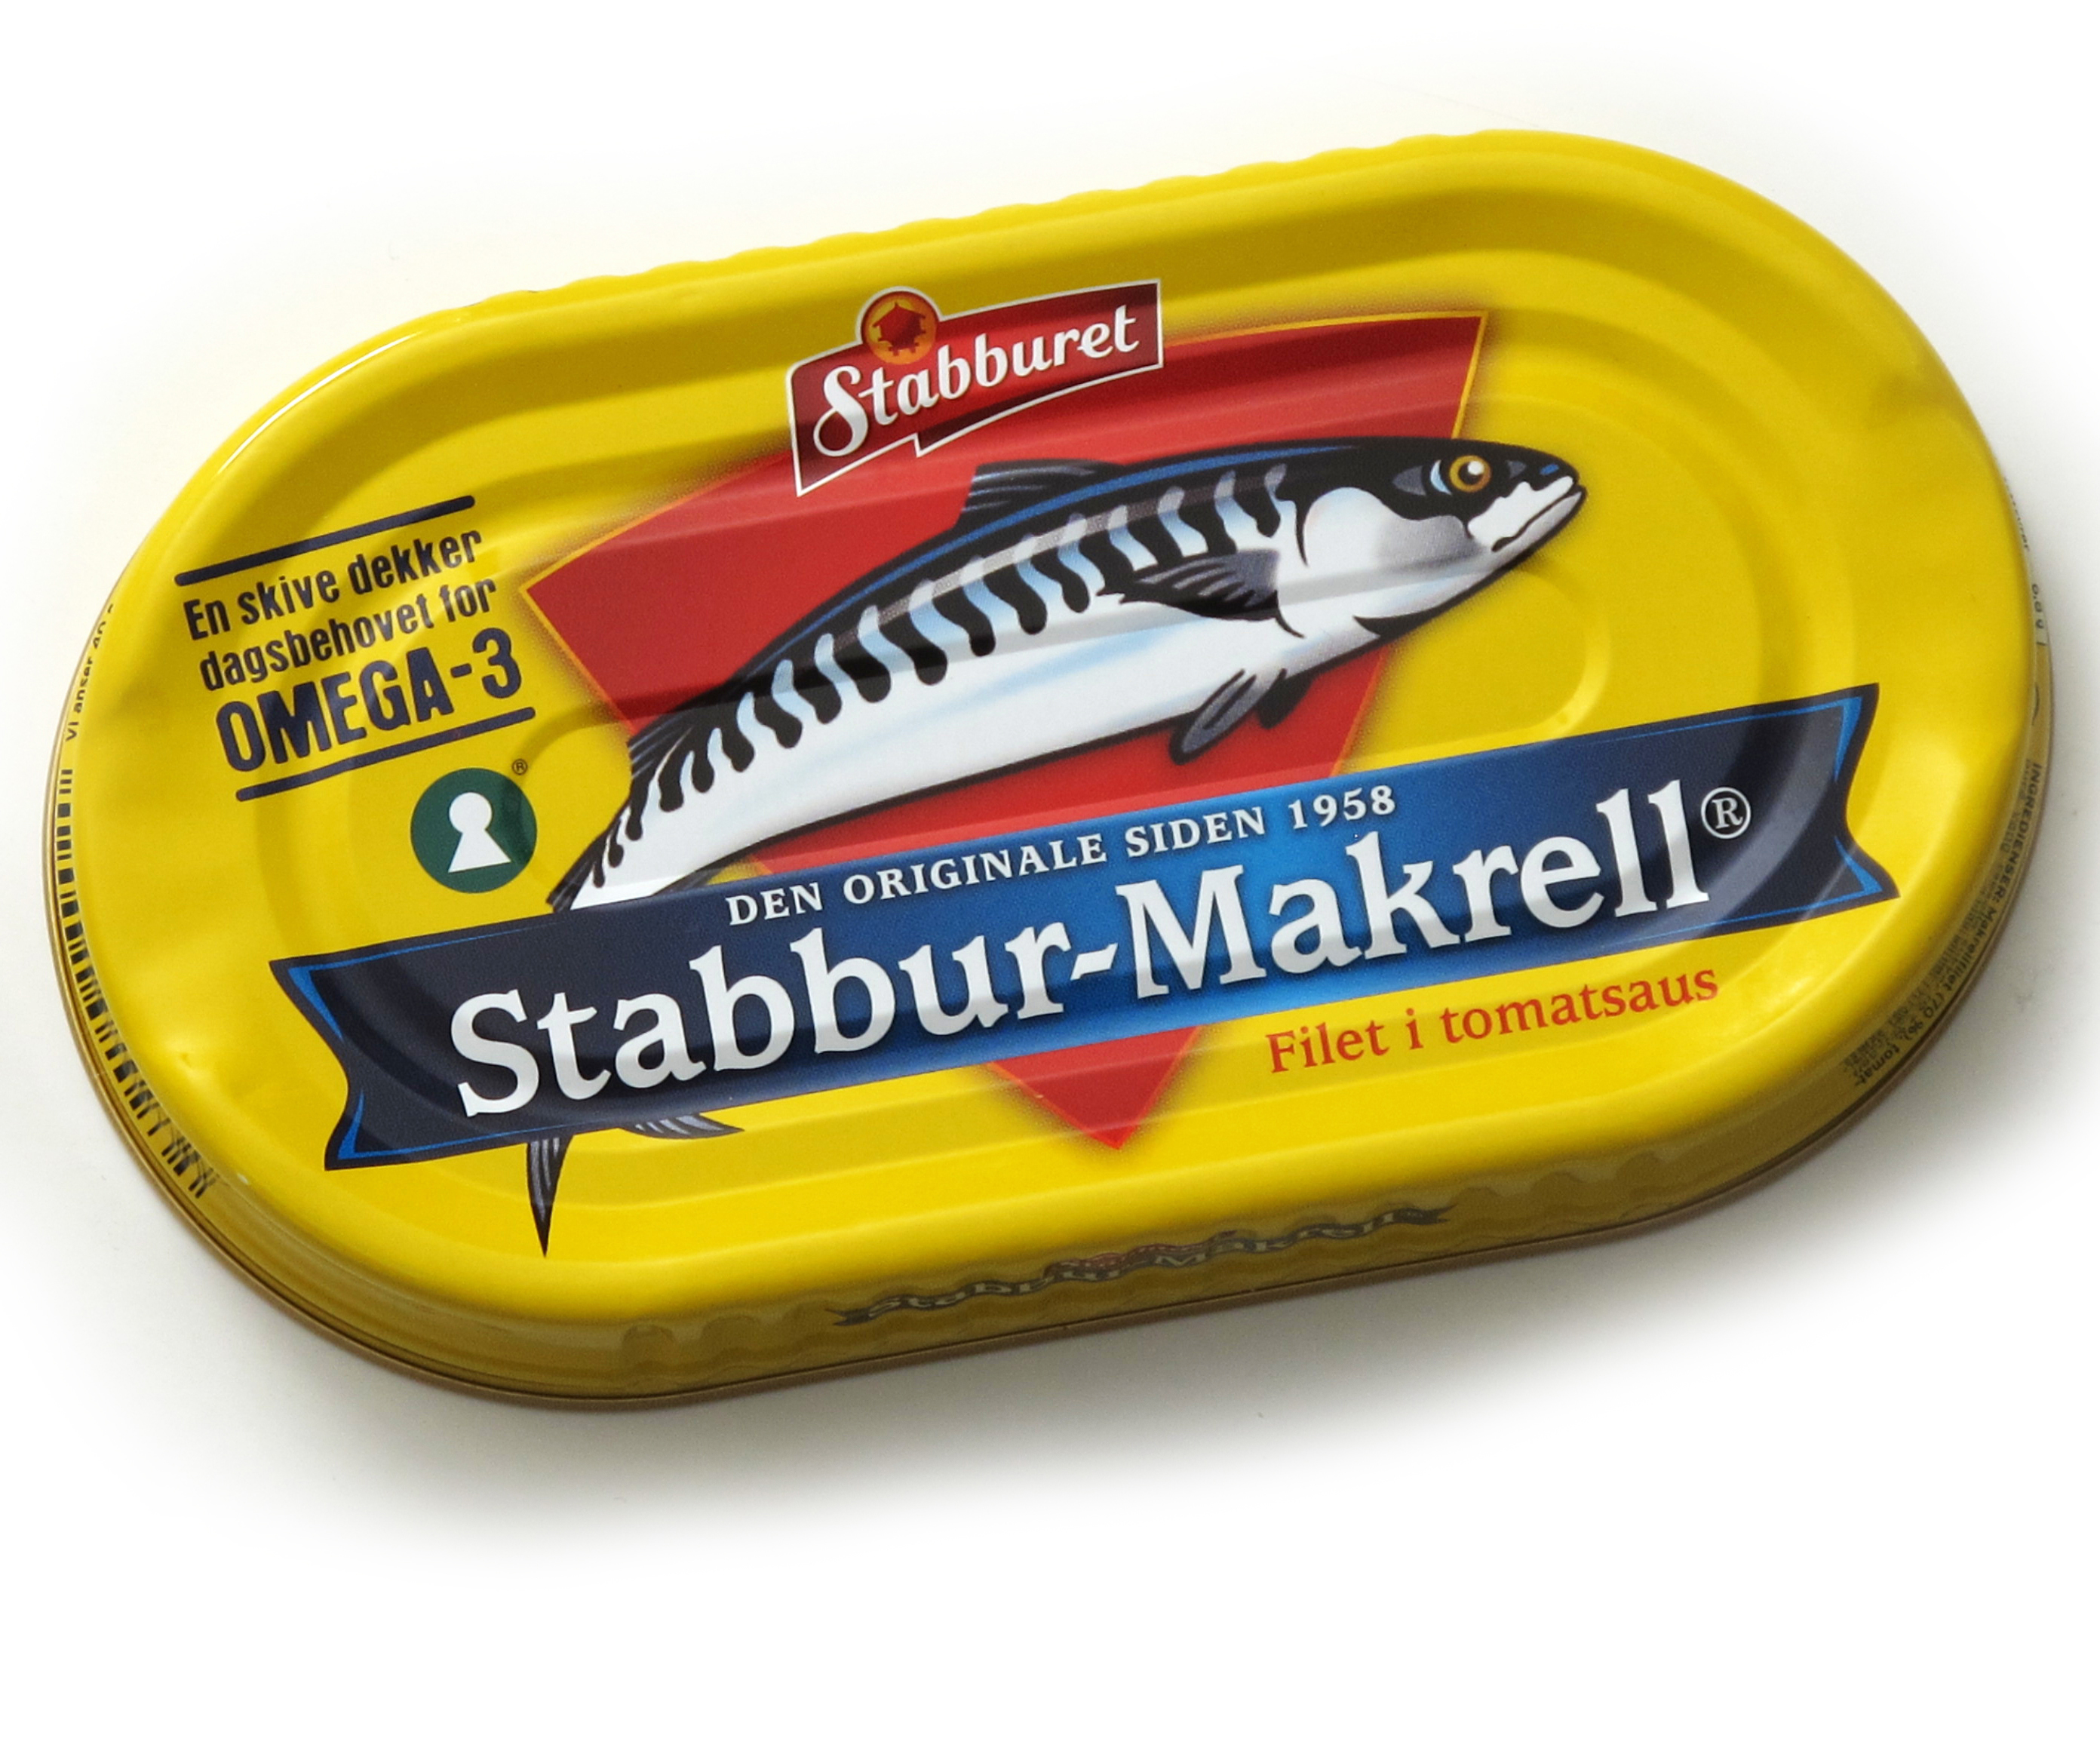 makrellstabbur